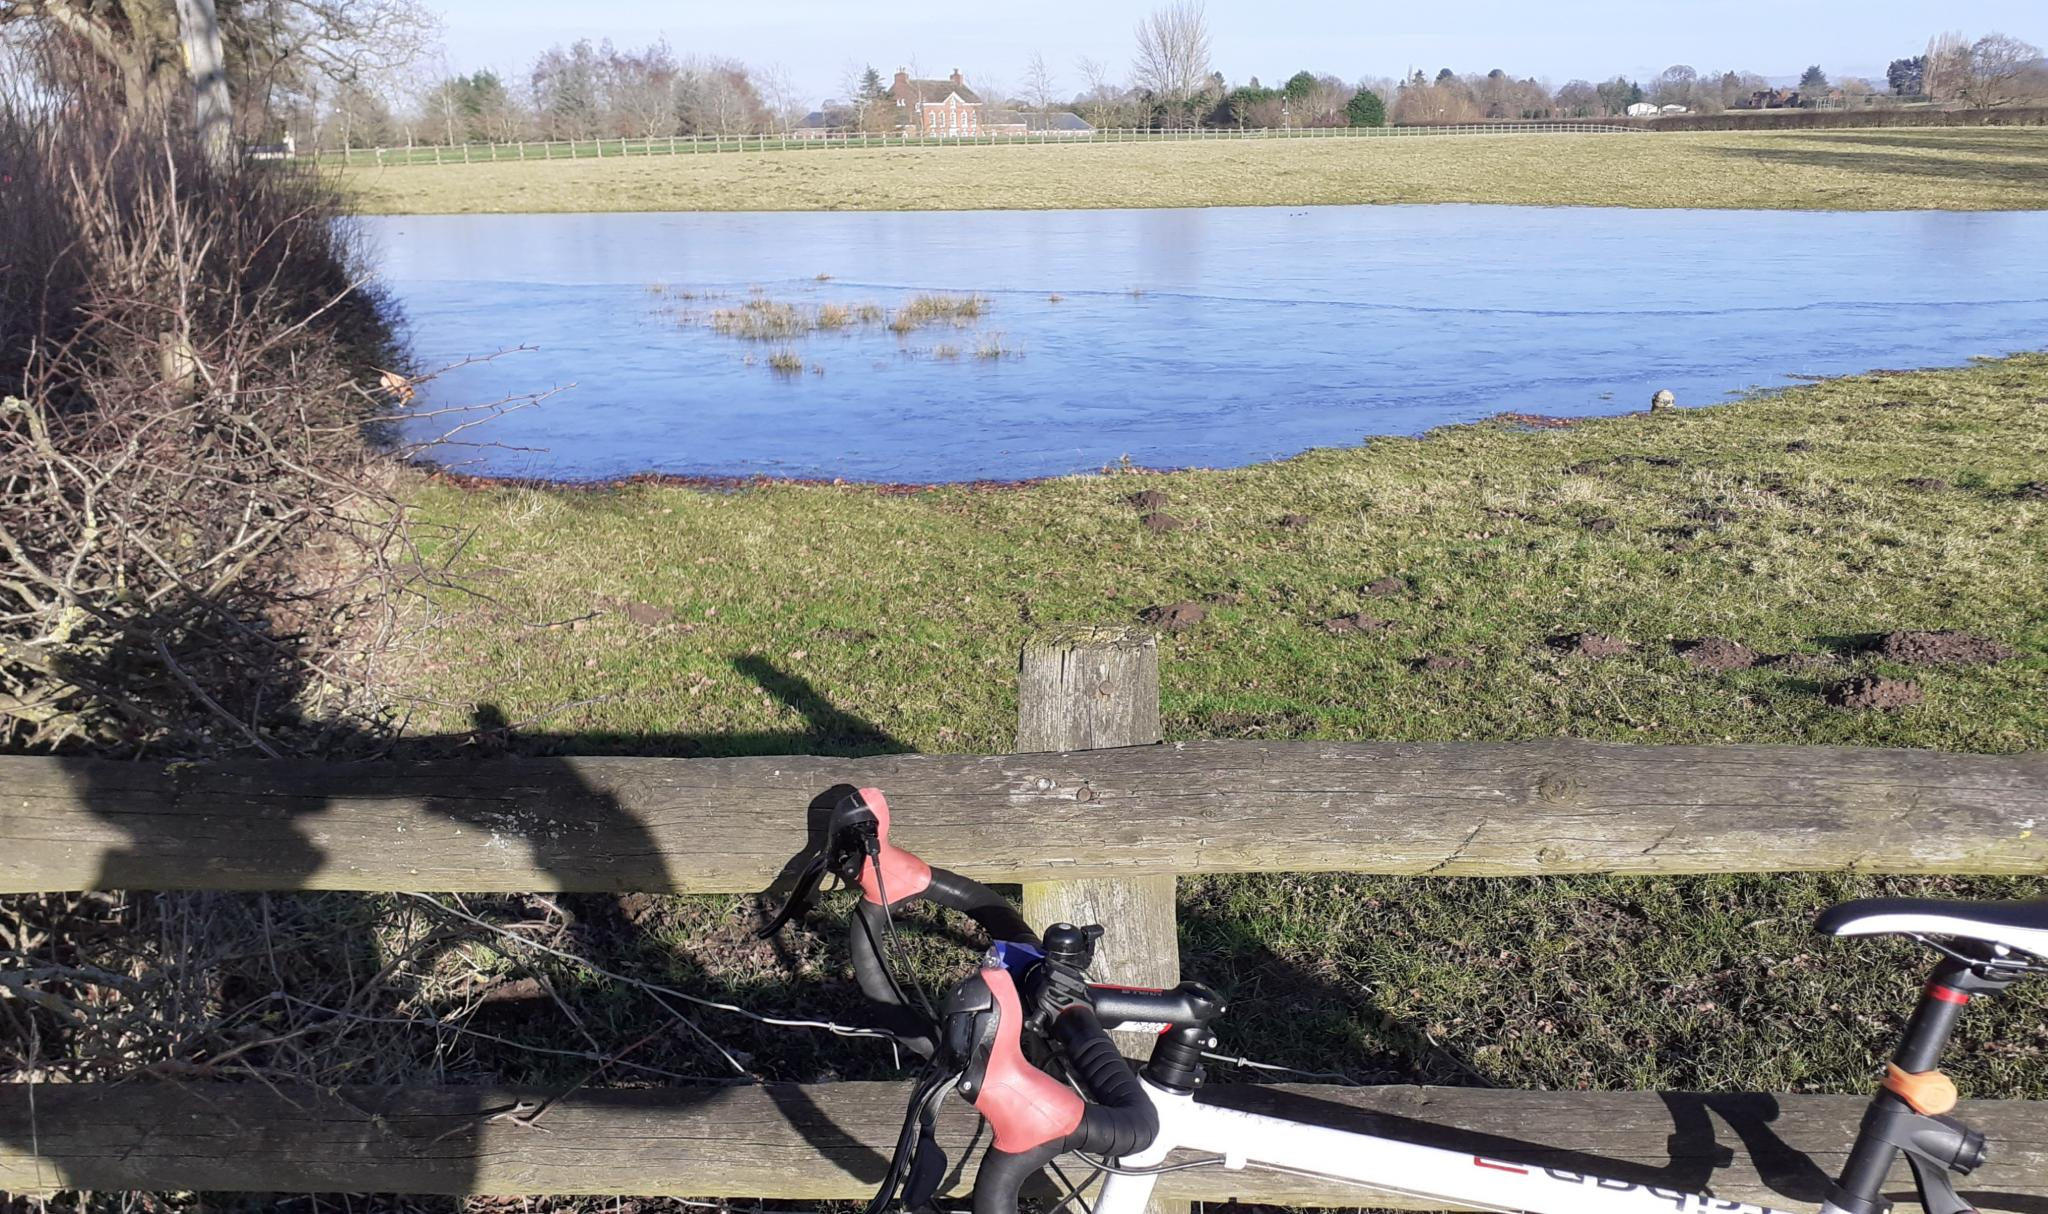 On my bike-20210201_153855-jpg